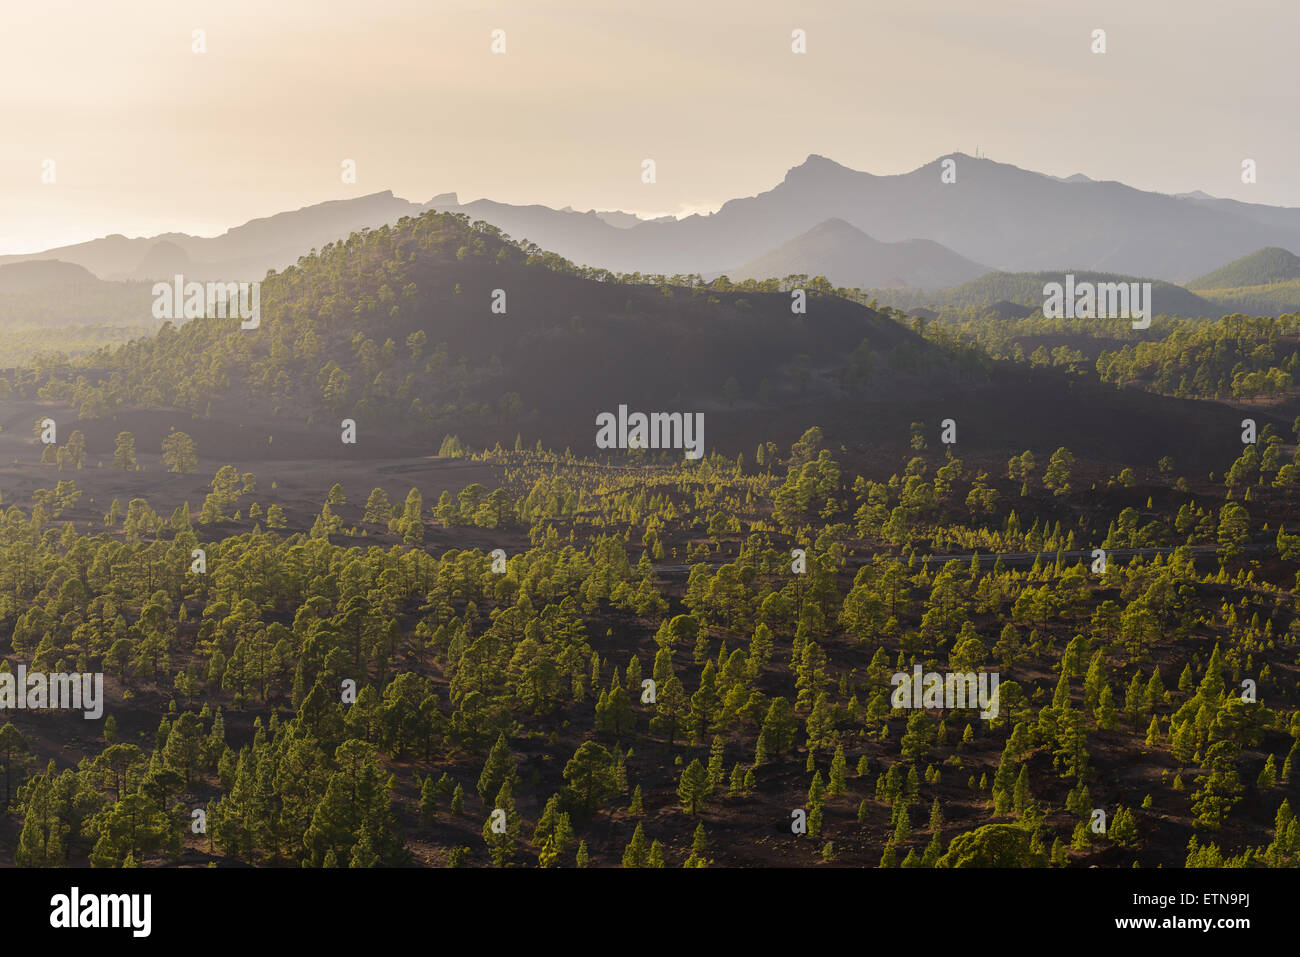 Baum bedeckt Vulkanlandschaft, Santiago del Teide, Kanarische Inseln, Spanien Stockbild